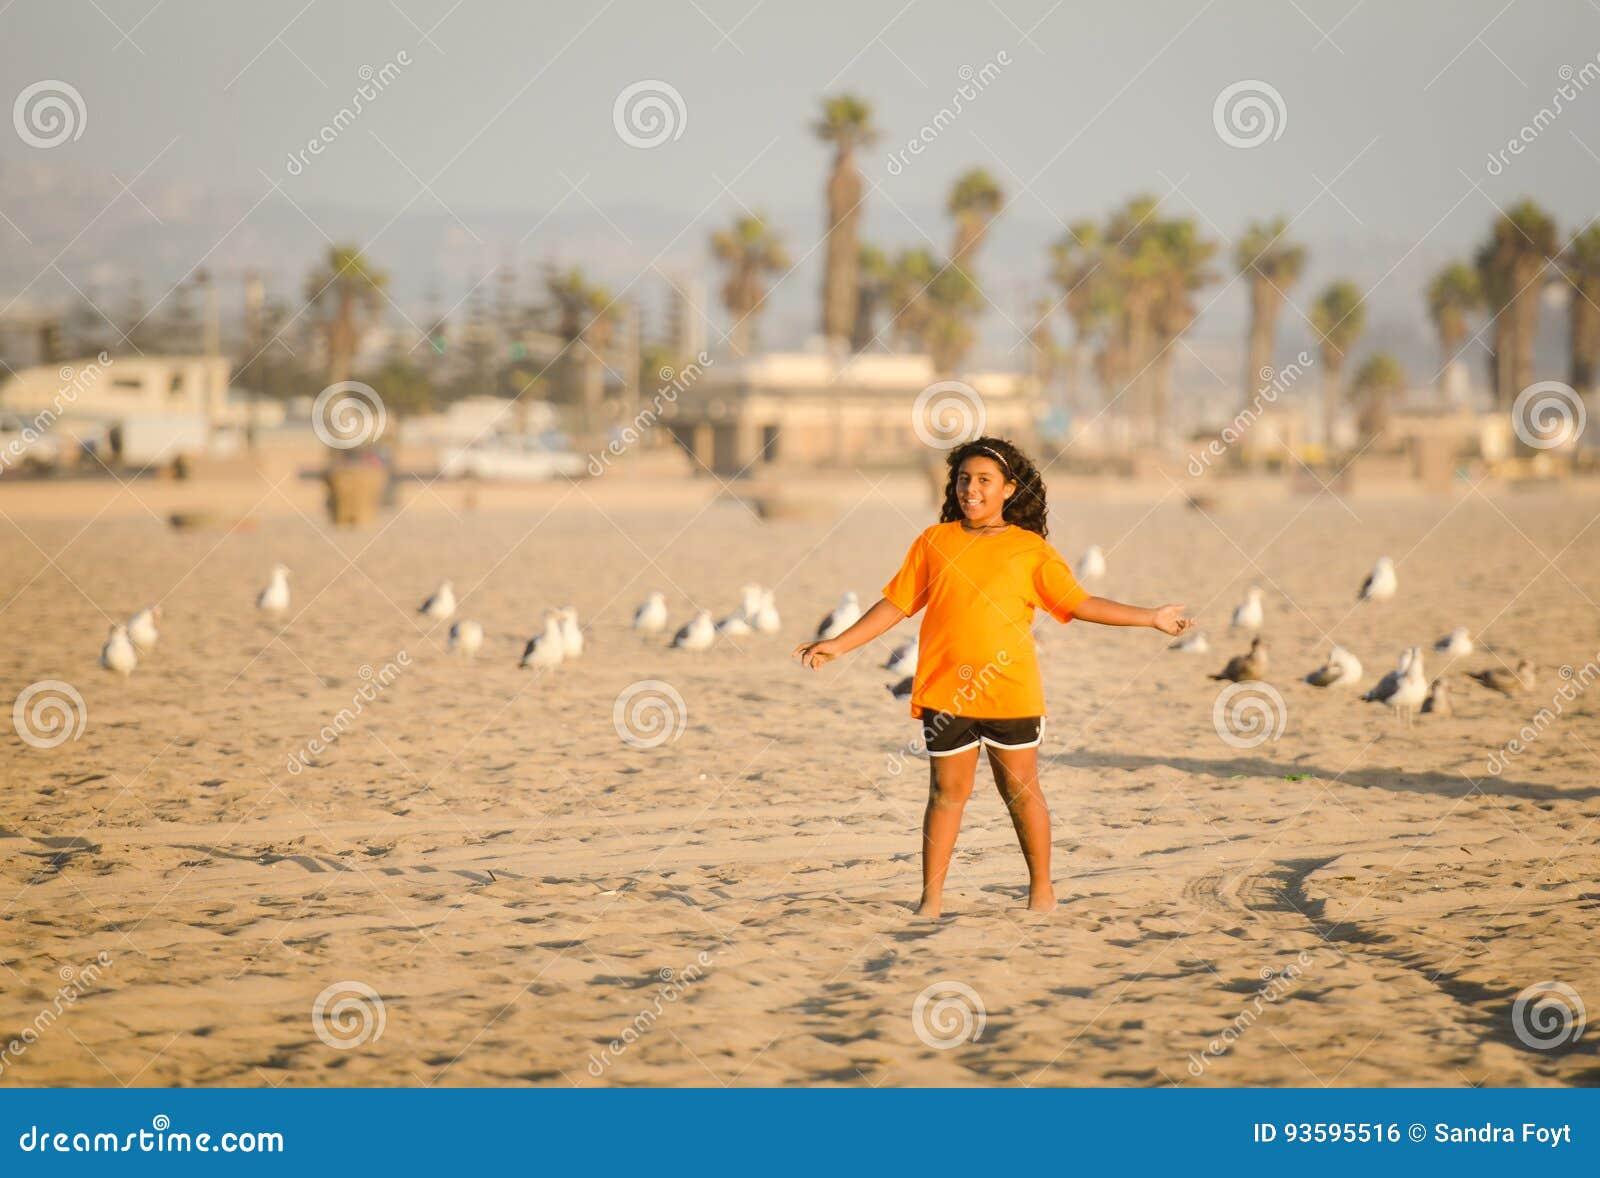 Girl and Seagulls - Huntington Beach, -California